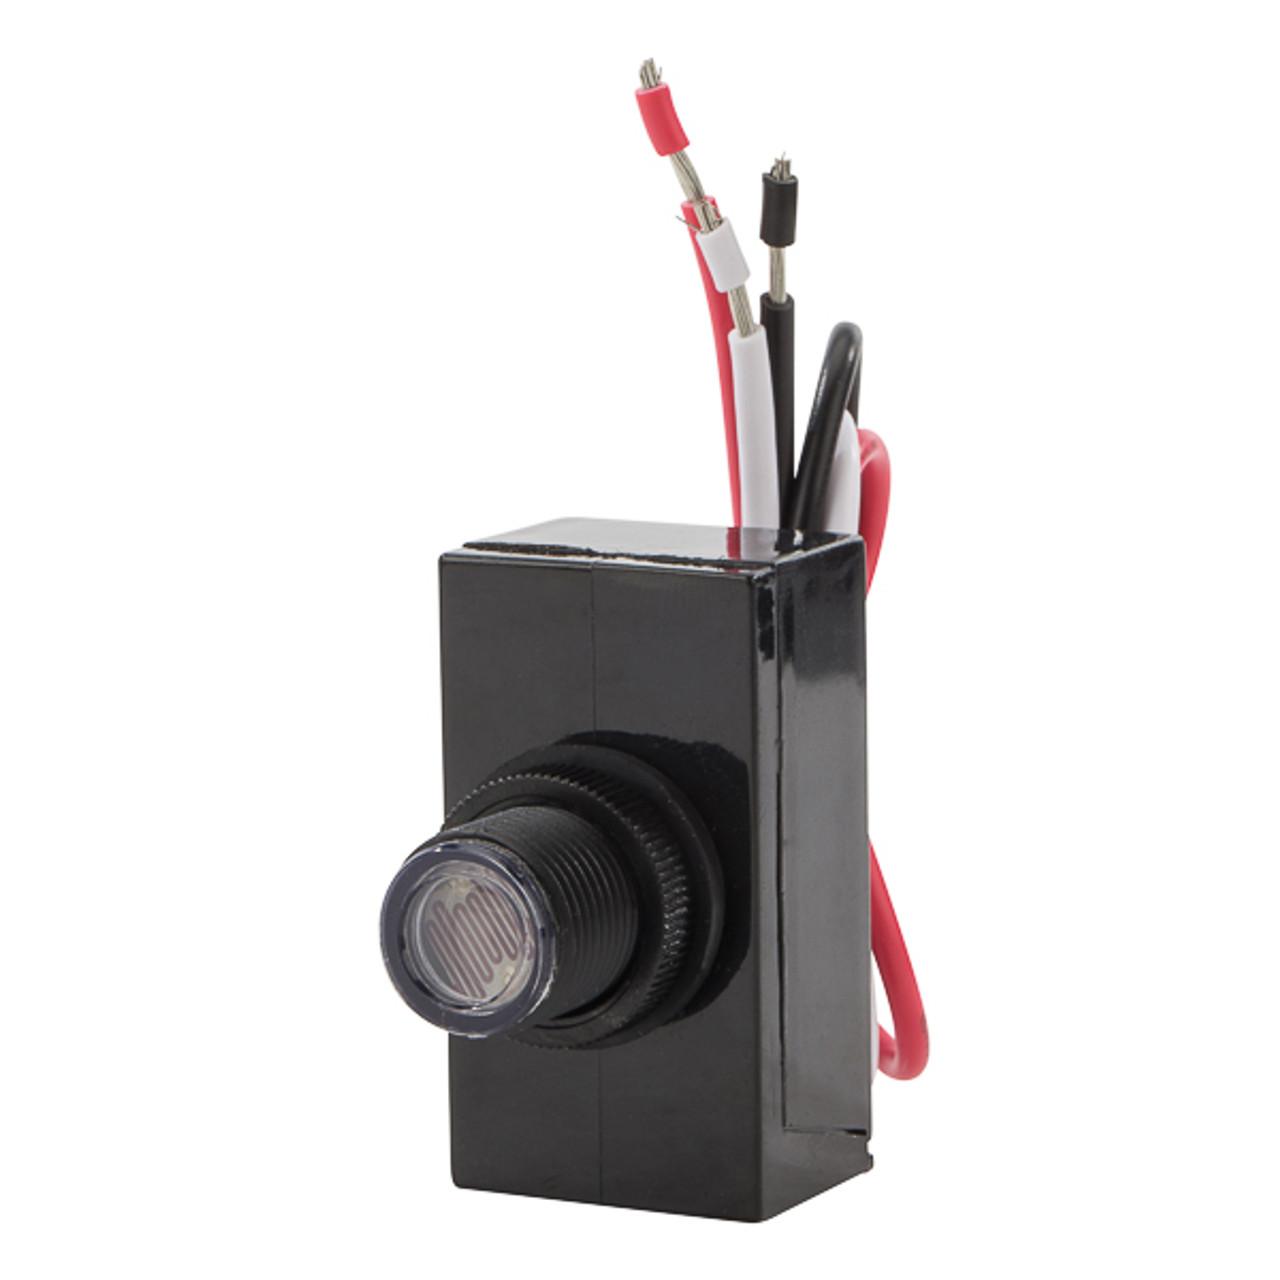 Tork 3000 120V 2000w Flush Mounted Photo Control